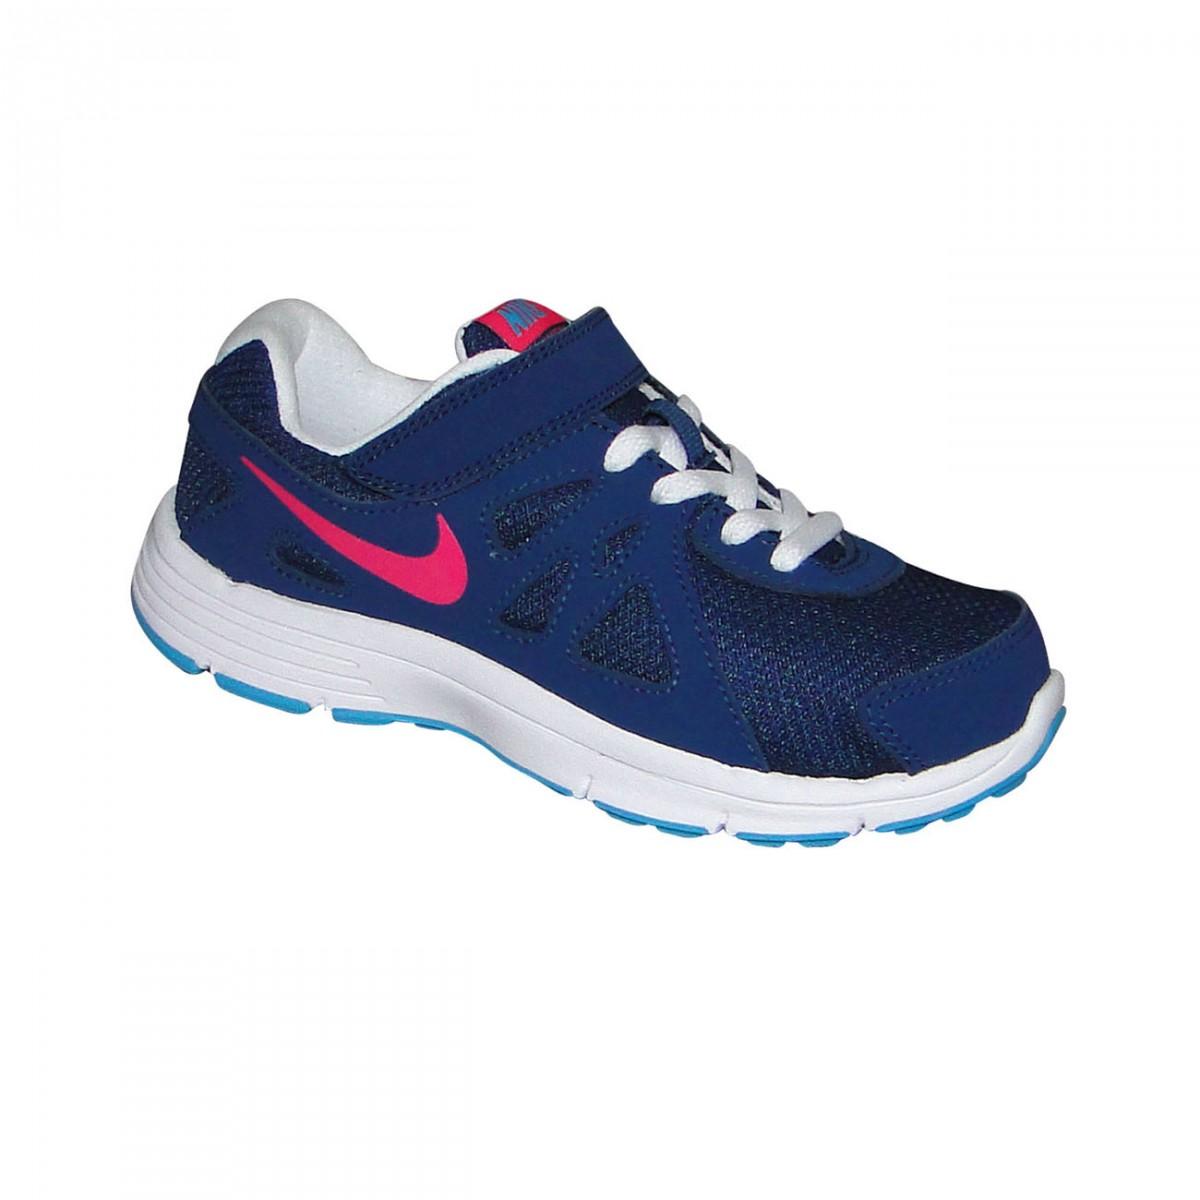 c4b50fc6d6e Tenis Nike Revolution 2 Infantil 555091 400 - Marinho Branco Pink ...